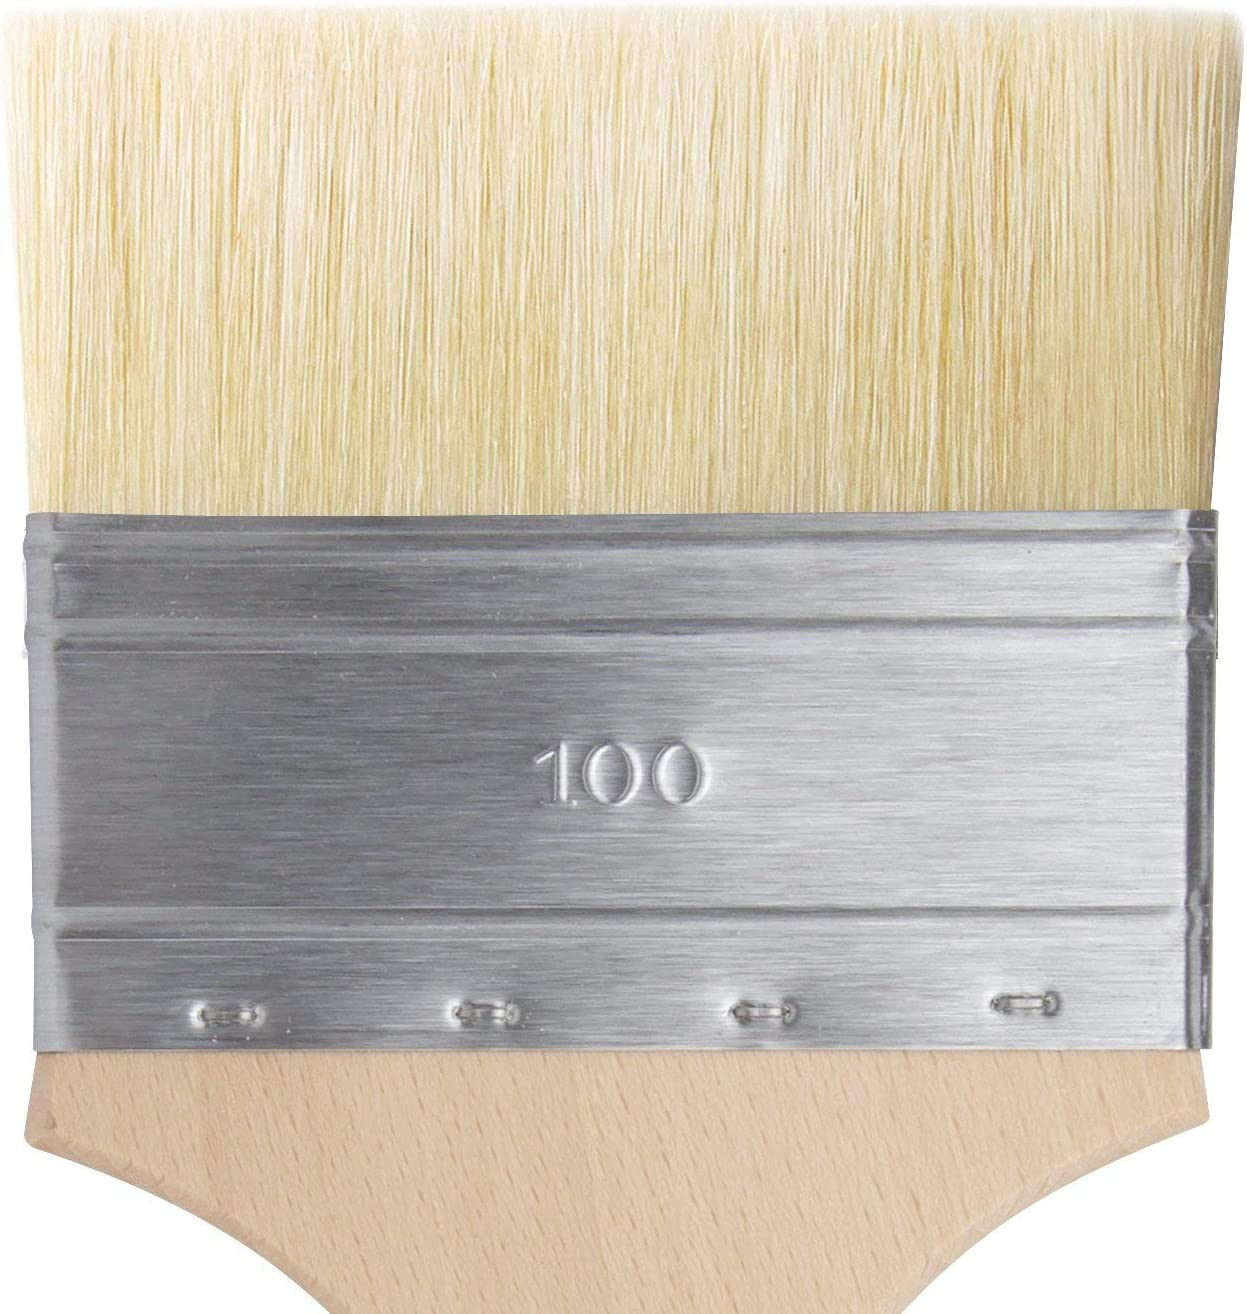 da Vinci Varnish /& Priming Series 2470 Mottler Brush 2470-20 Medium Hog Bristle with Plainwood Handle Size 20